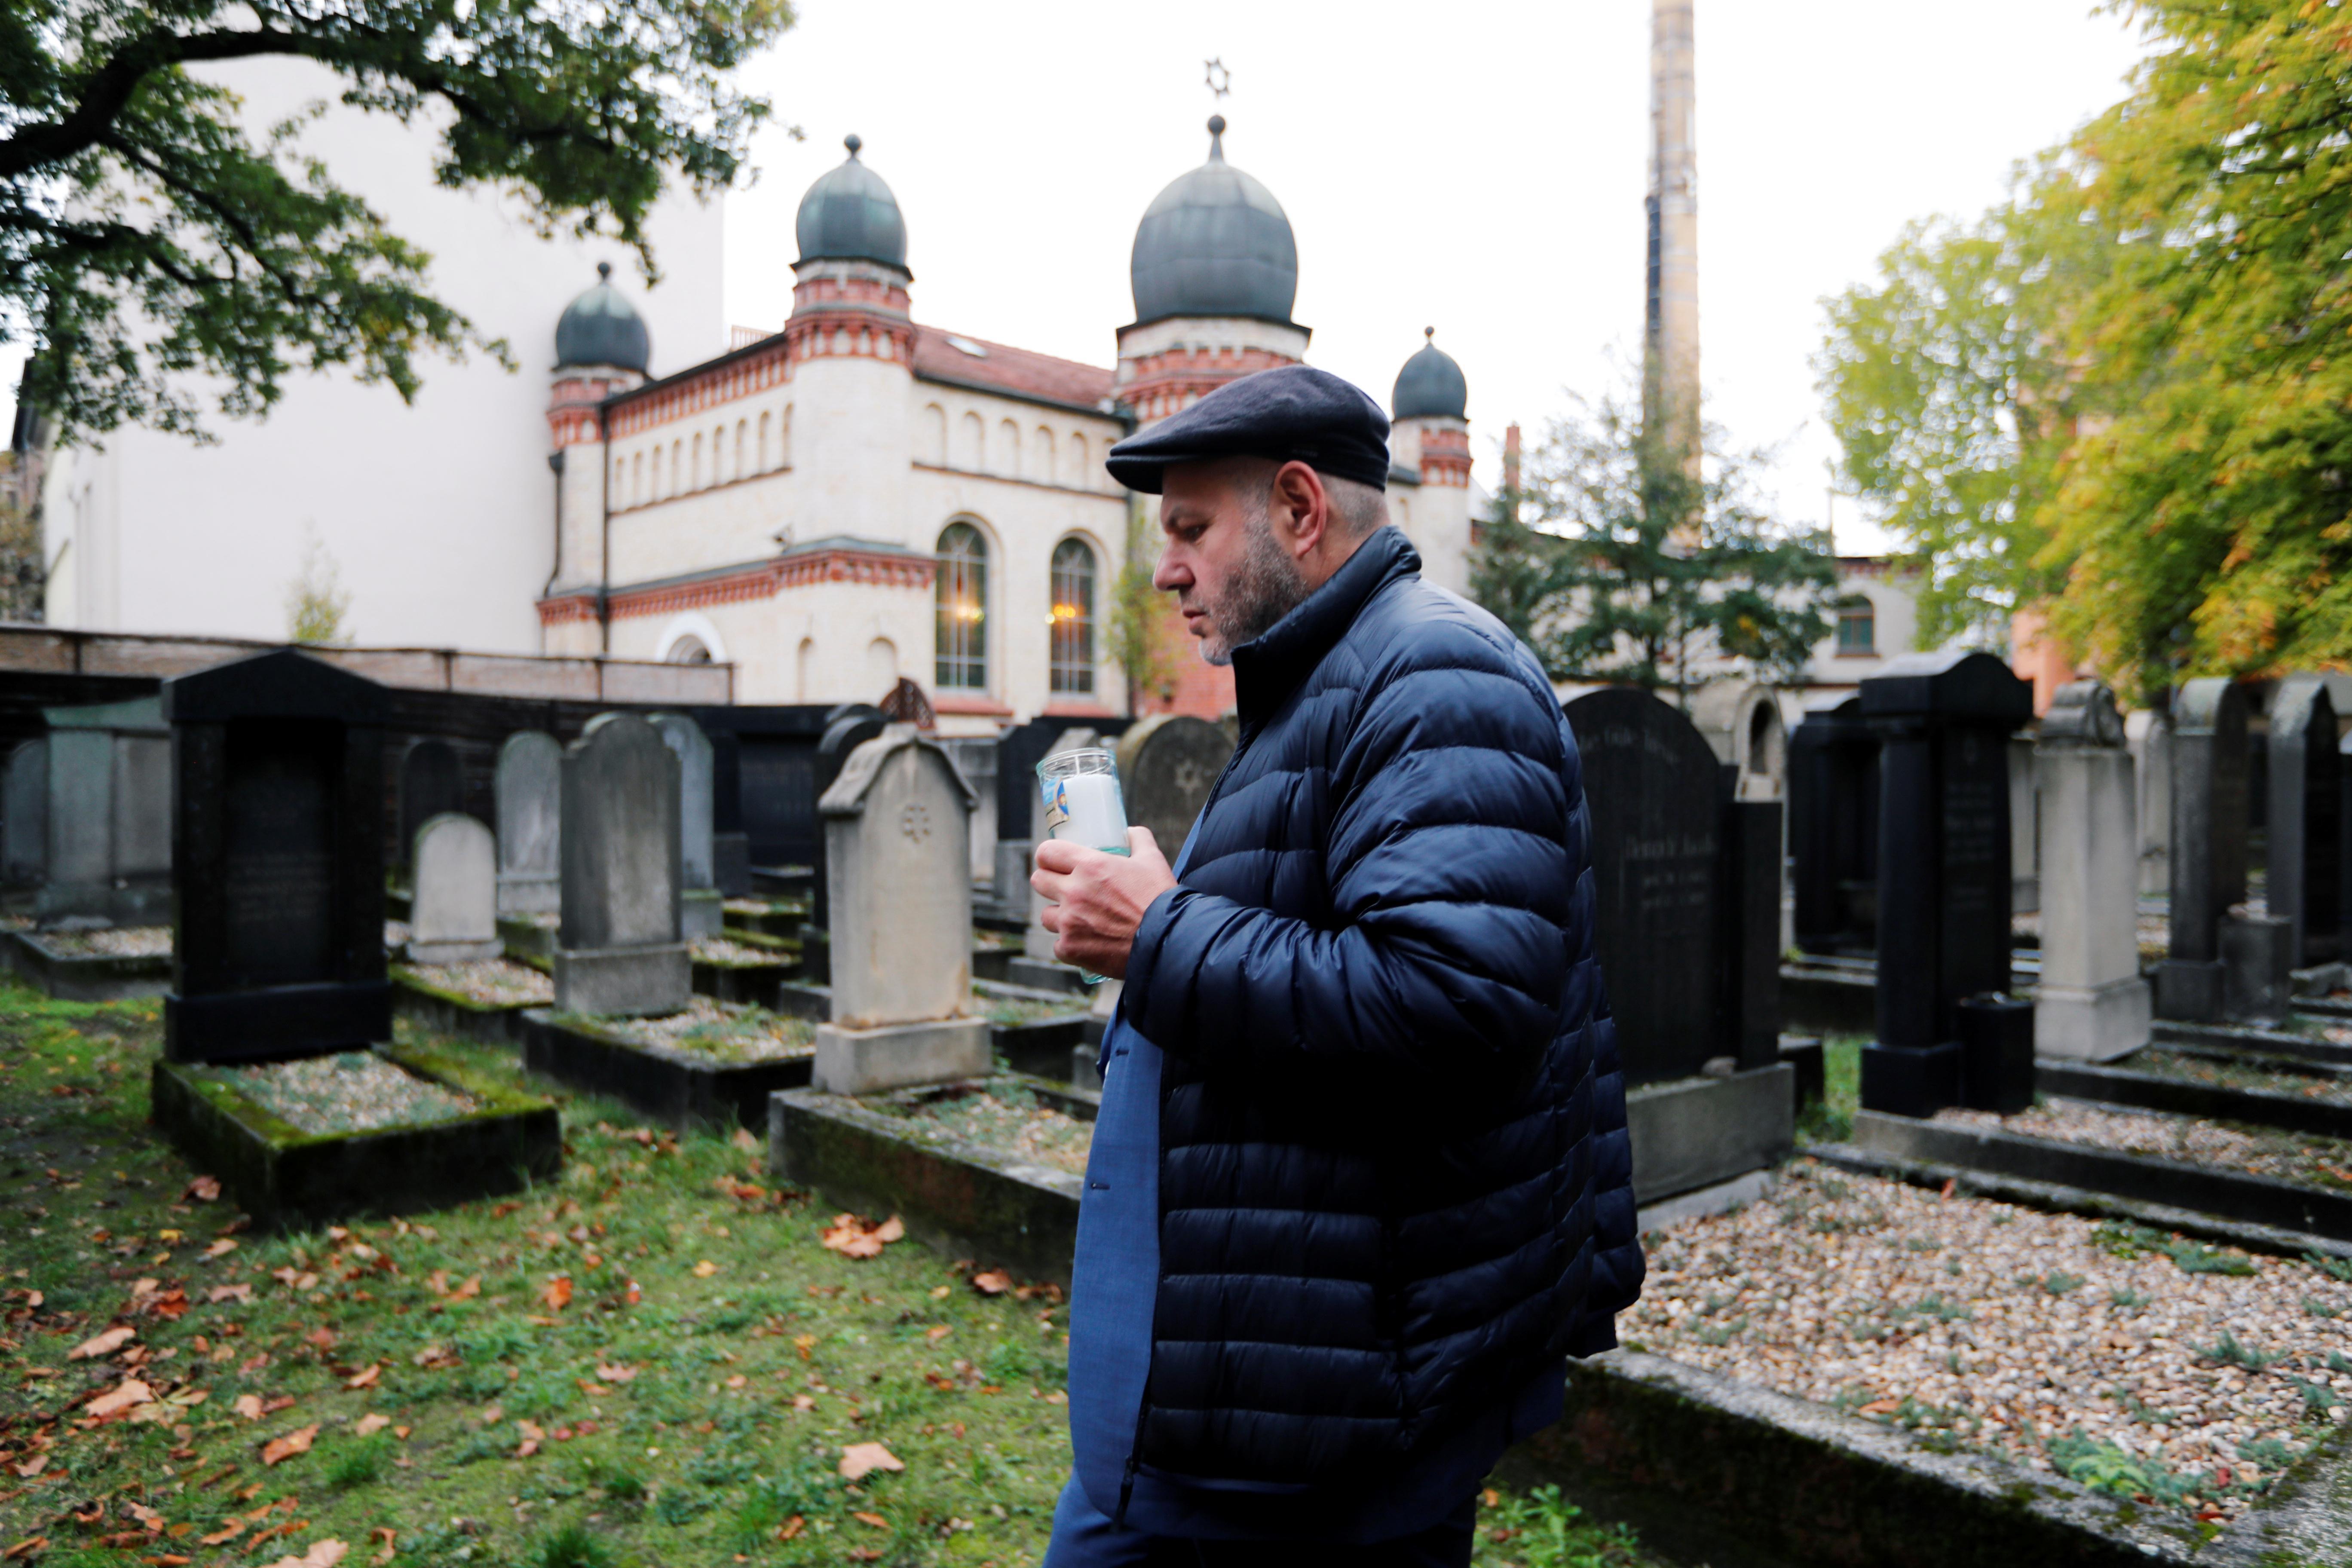 Jewish leader says German synagogue attacked by gunman inadequately protected